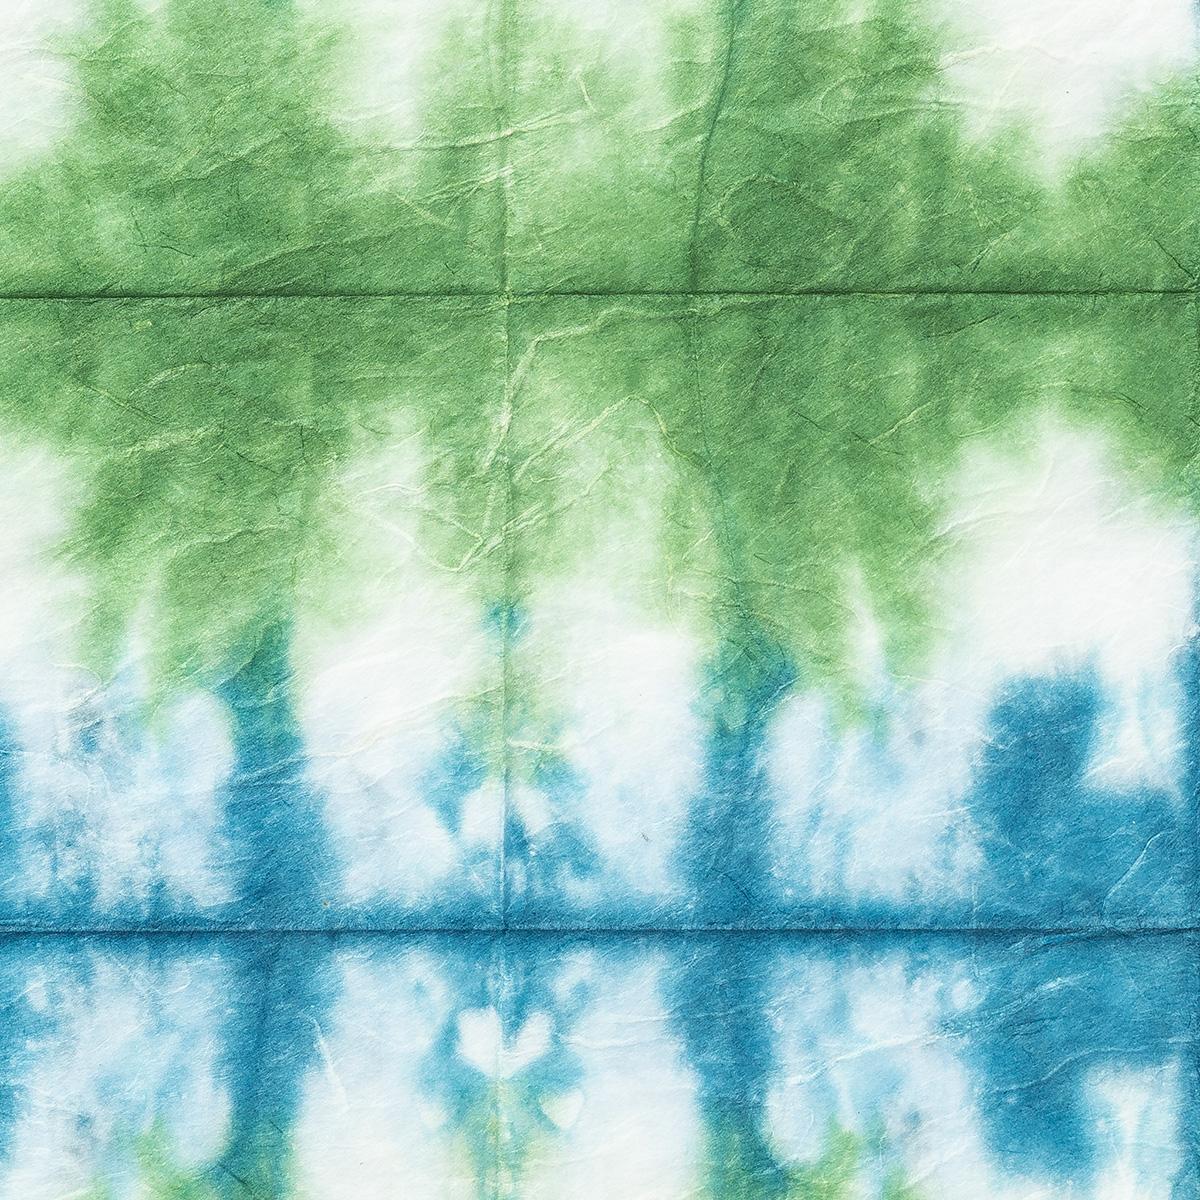 楮6匁 雲竜紙 板締め No.20